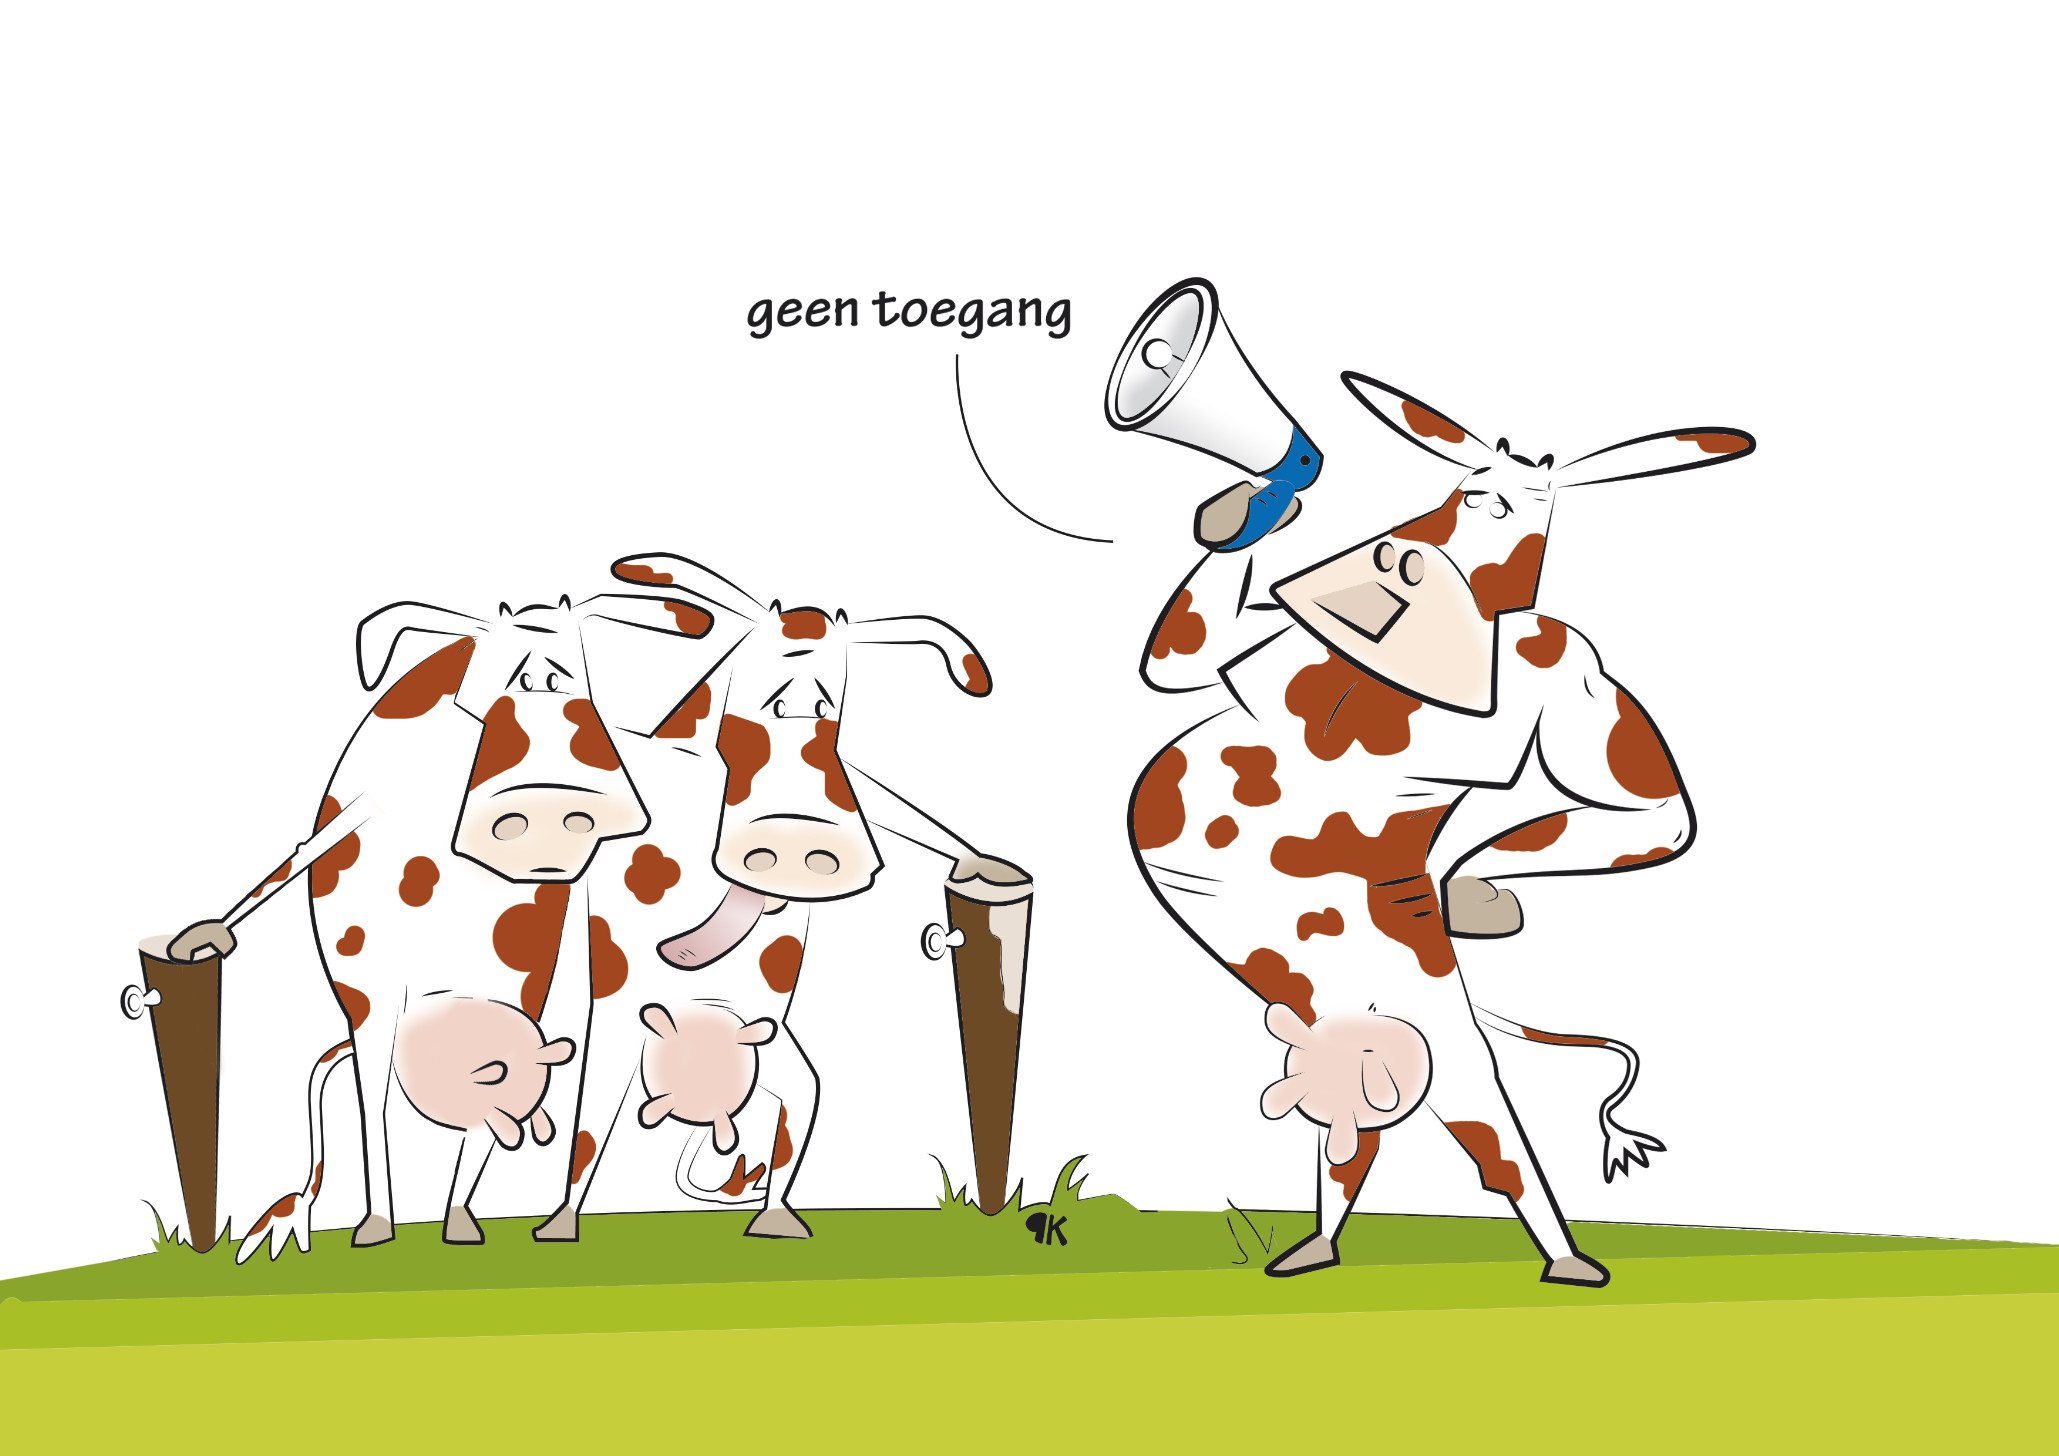 Afrikaanse vraag naar uien groeiende kracht van Nederlandse export